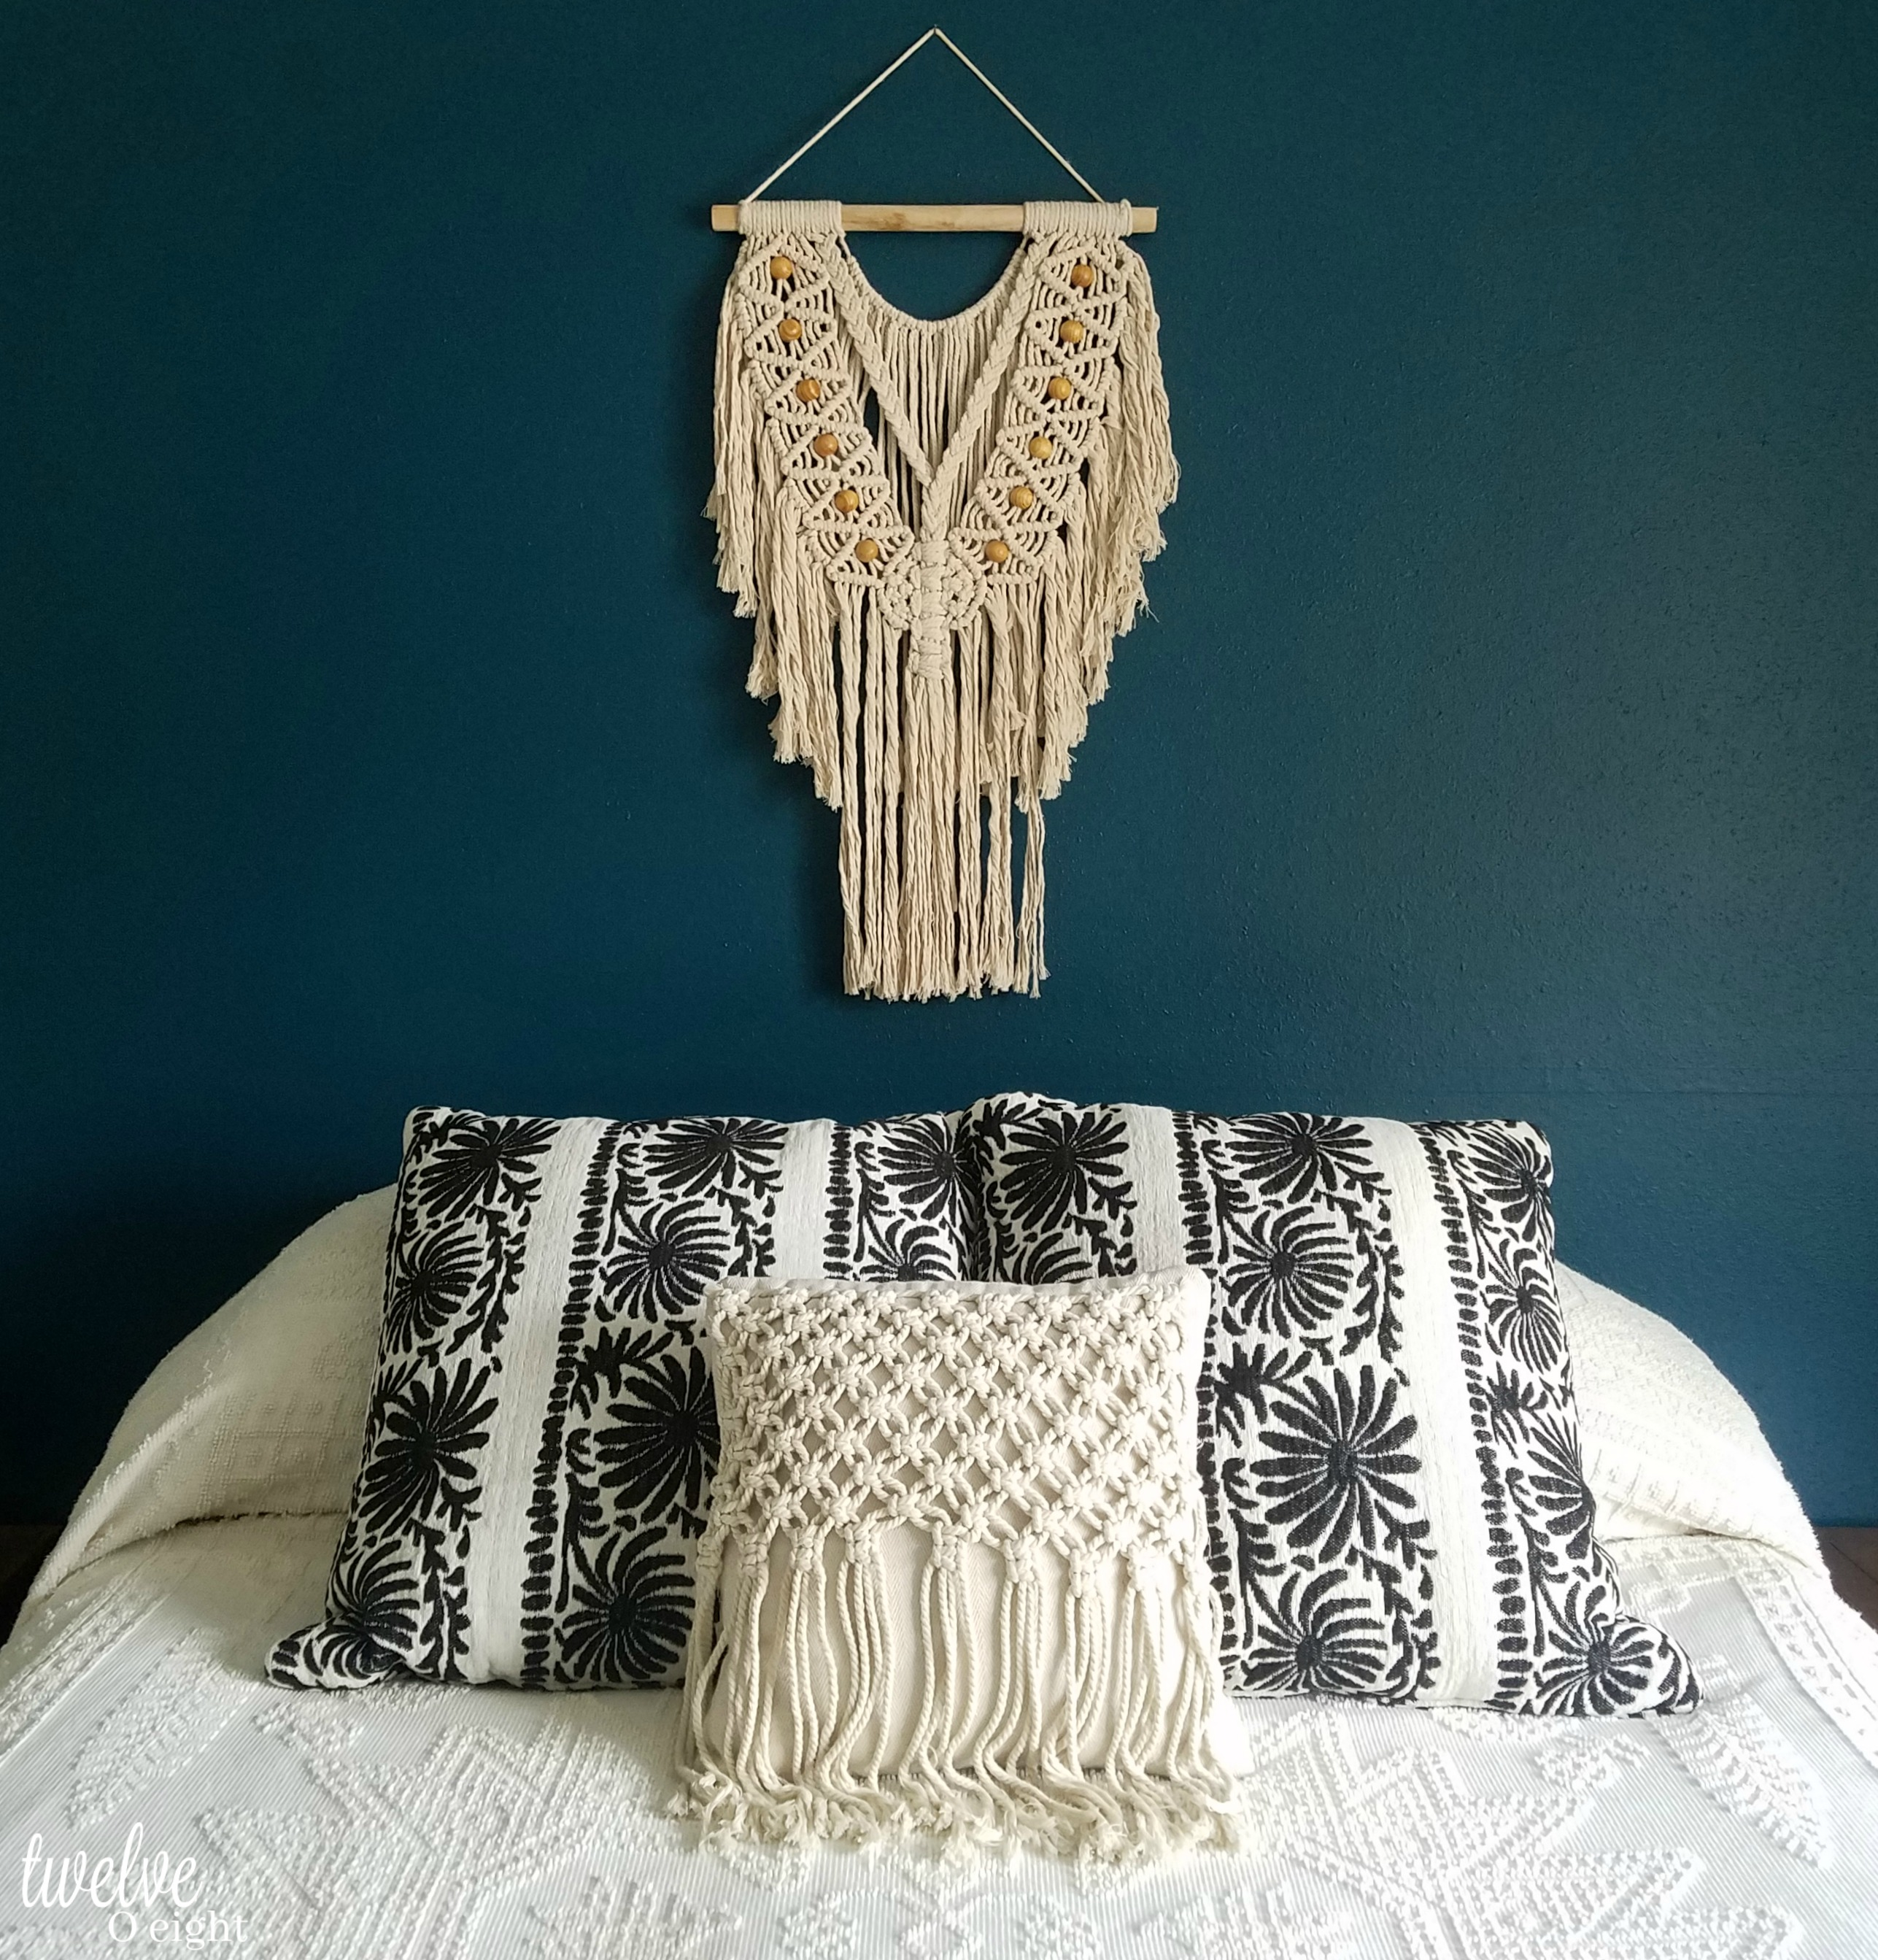 Modern bohemian bedroom 1   twelveOeight